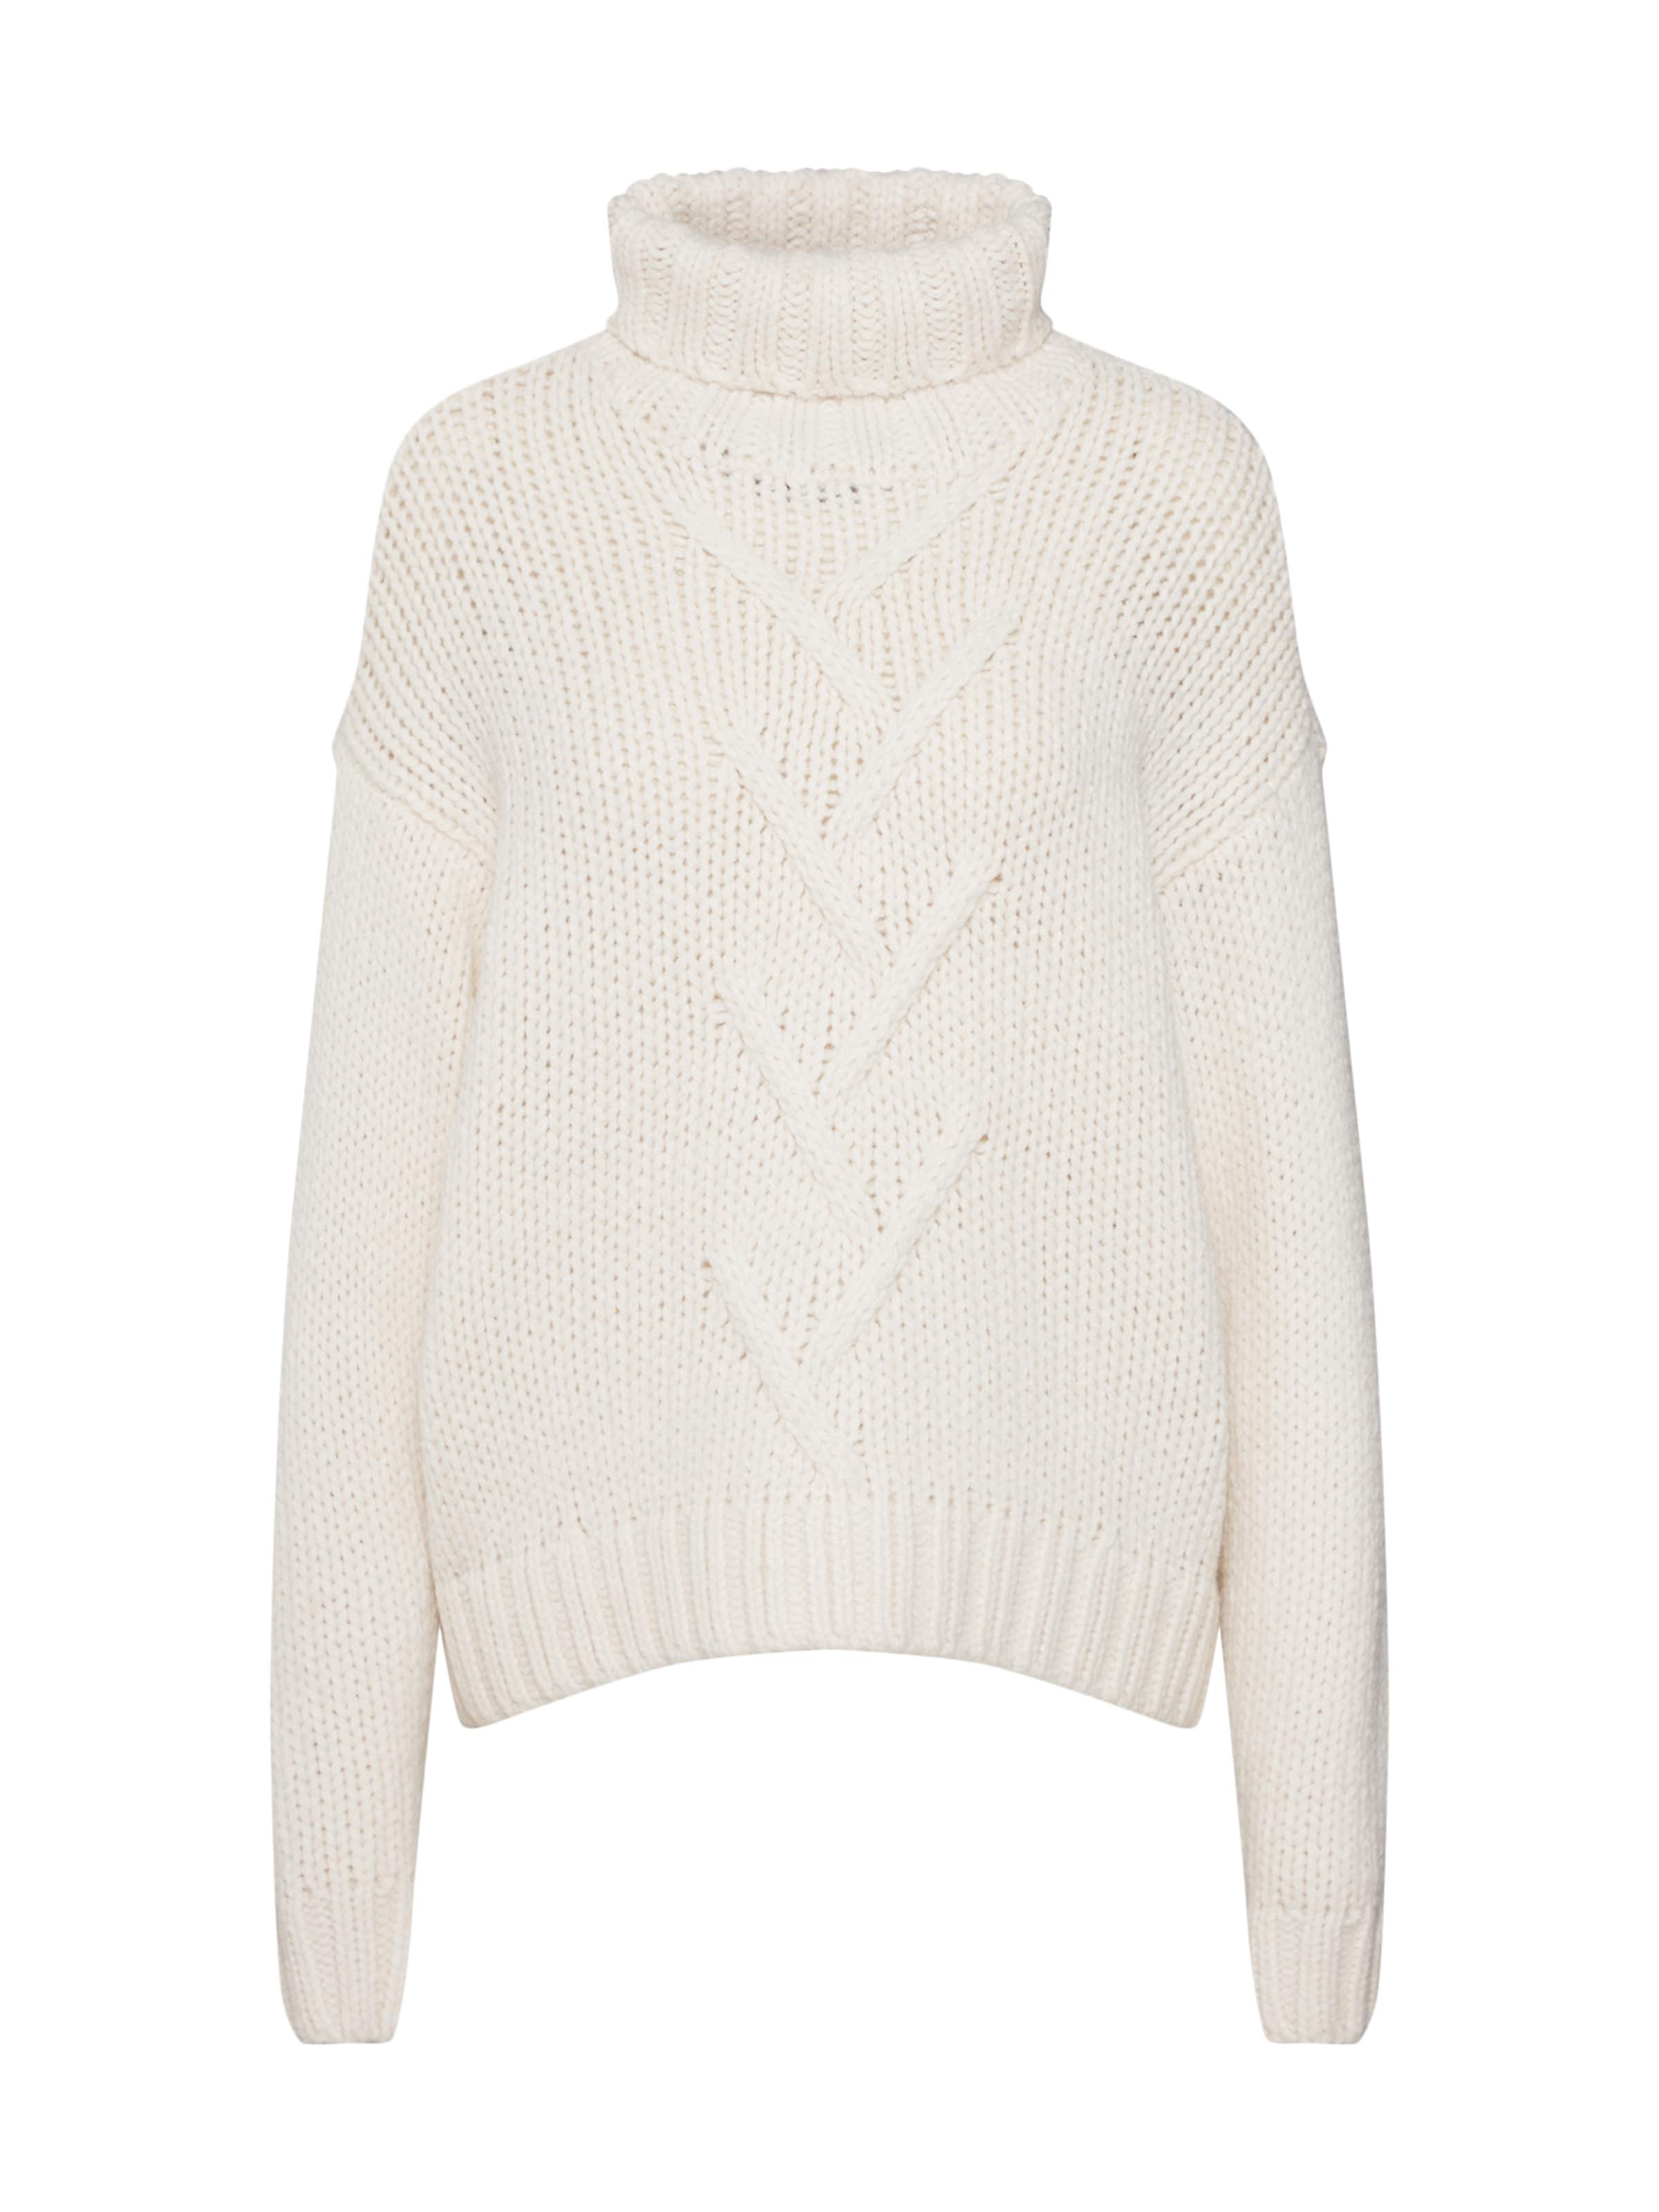 s Blanc over L Noisy 'nmkira High In Knit' MayPull Neck 0wknN8XZOP